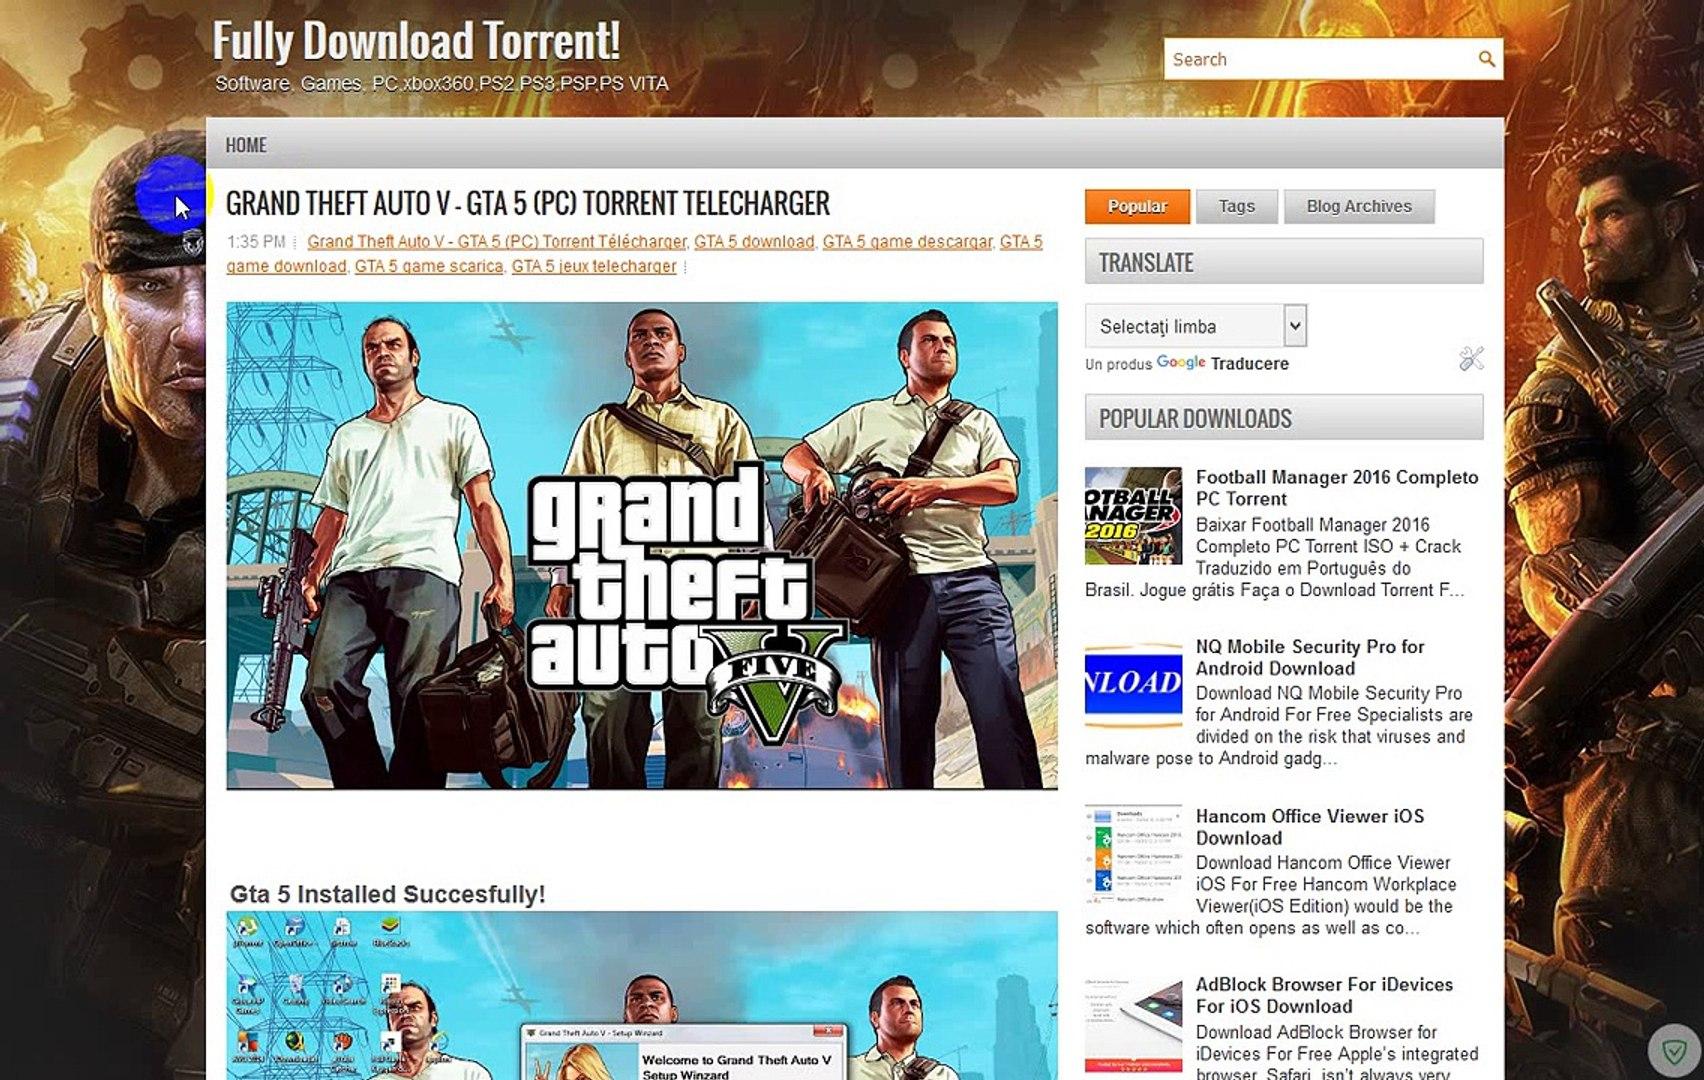 Grand Theft Auto V - GTA 5 (PC) Torrent Télécharger